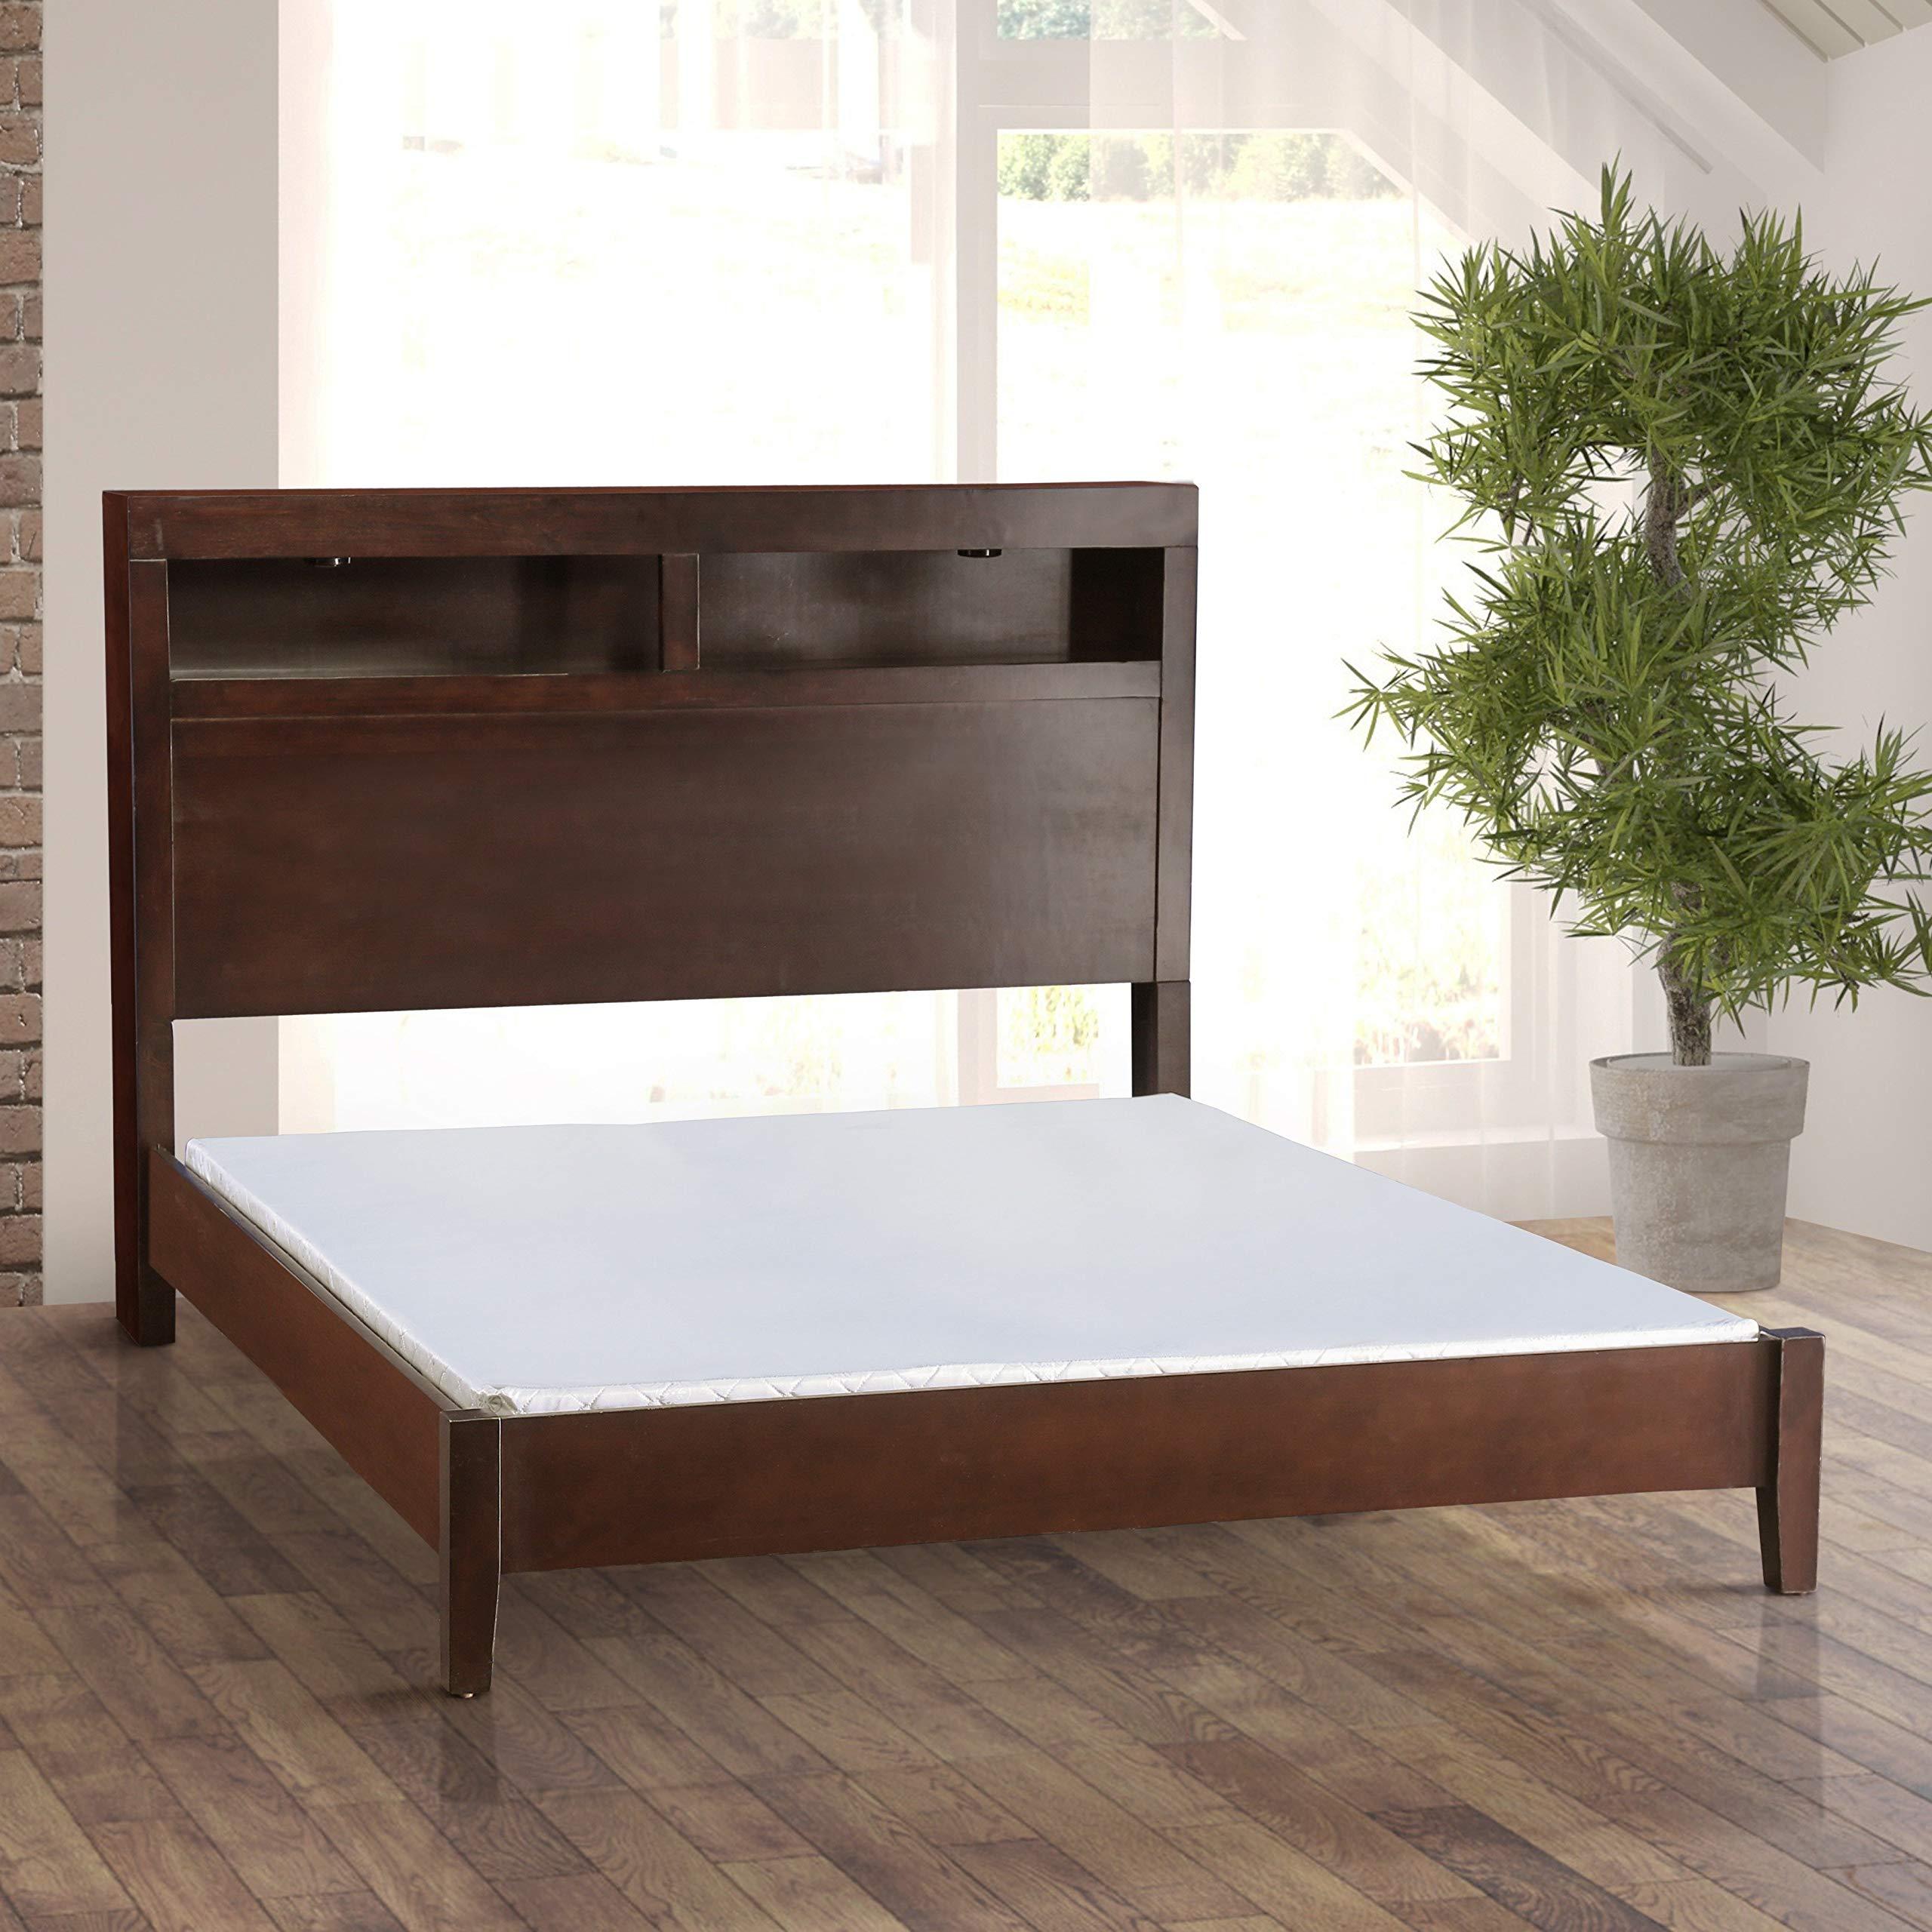 Furniture of America miBasics 2-inch Californian King-Size Bunkie Board